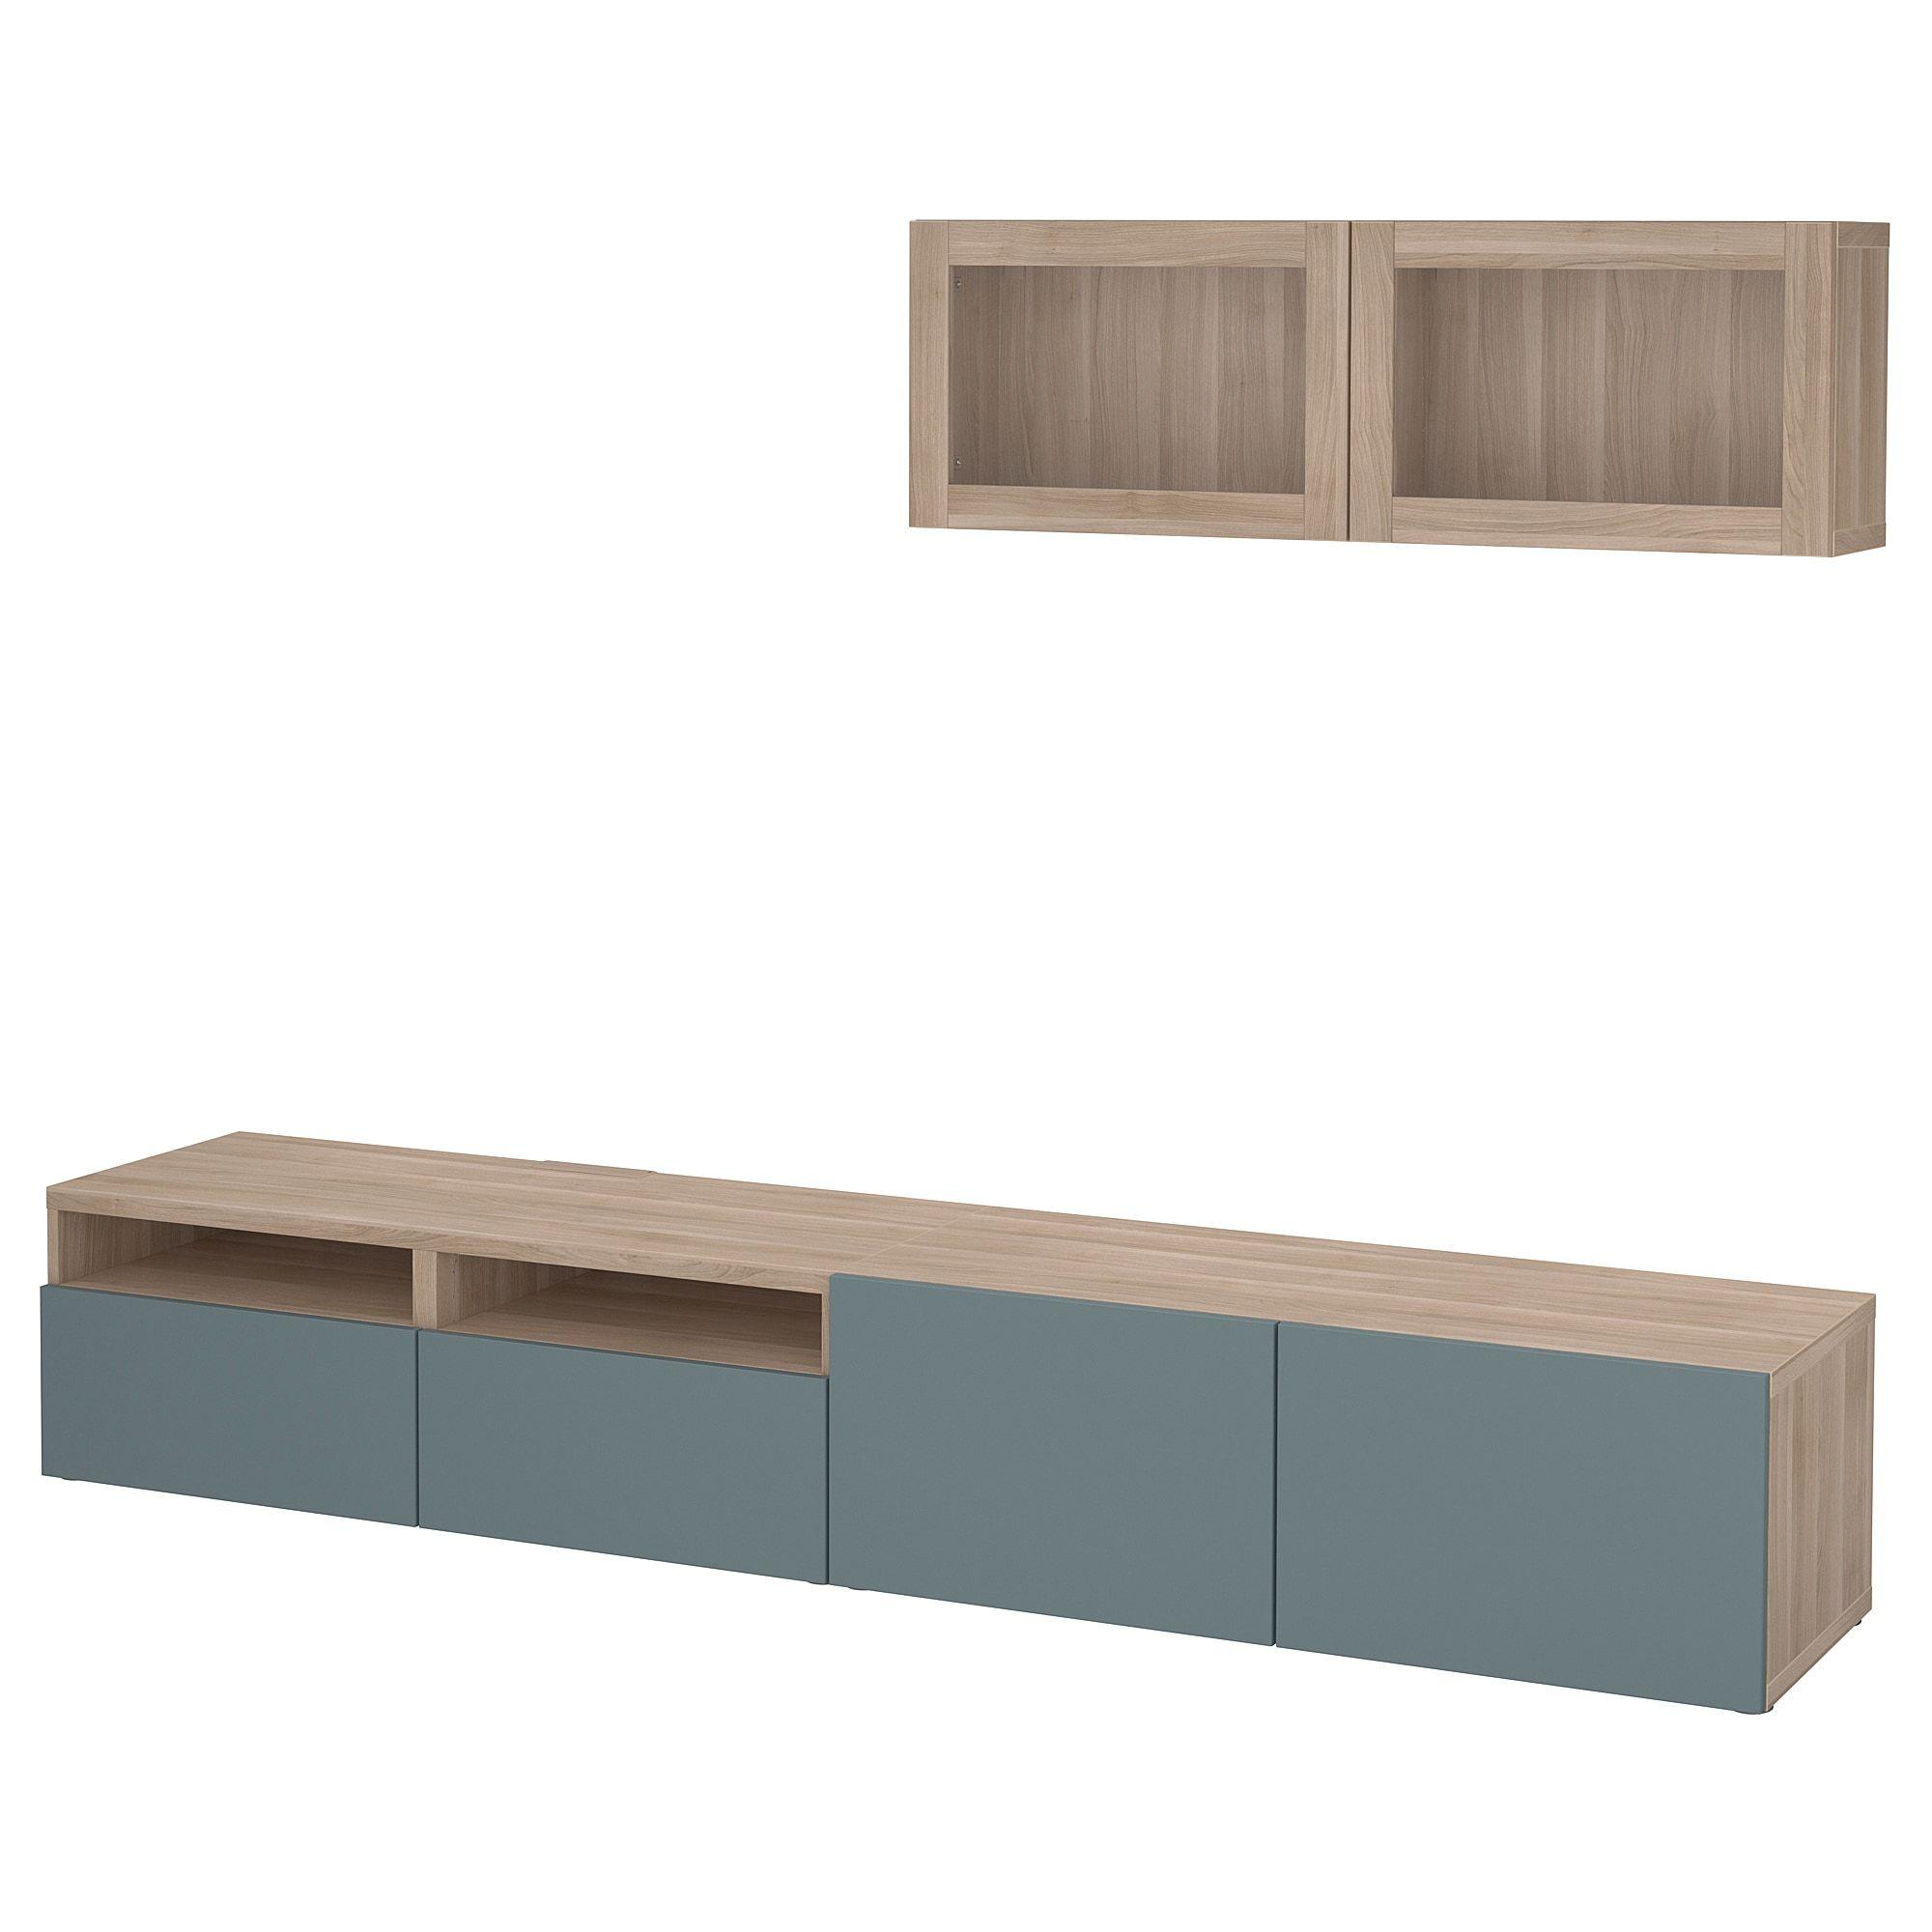 Tv Storage Combination Glass Doors Besta Walnut Effect Light Gray Valviken Gray Turquoise Clear Glass Meuble Tv Meuble Tele Mural Et Ikea